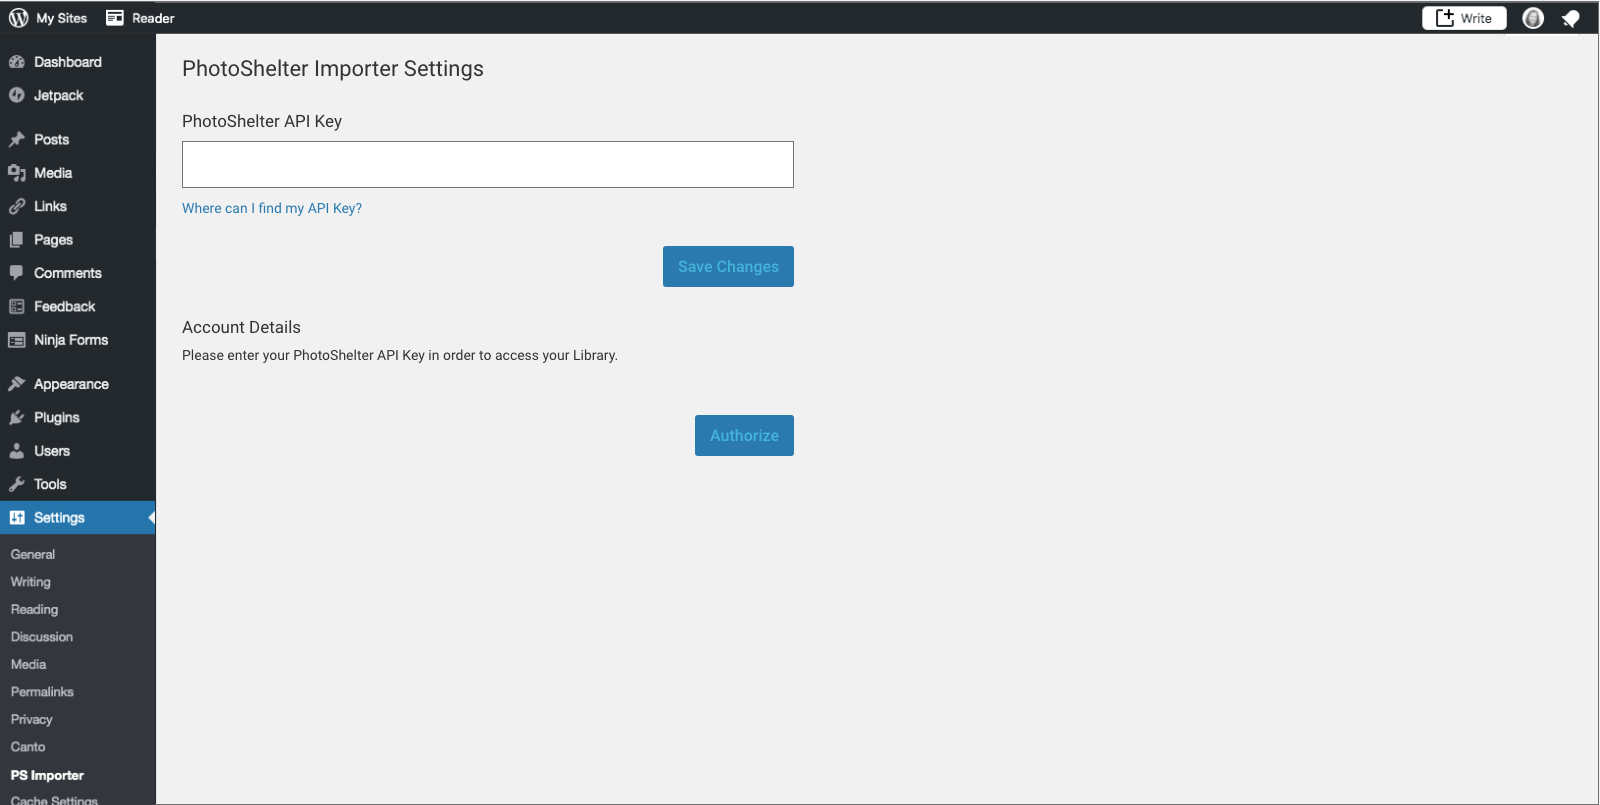 Enter your API key under Settings > PS Importer.